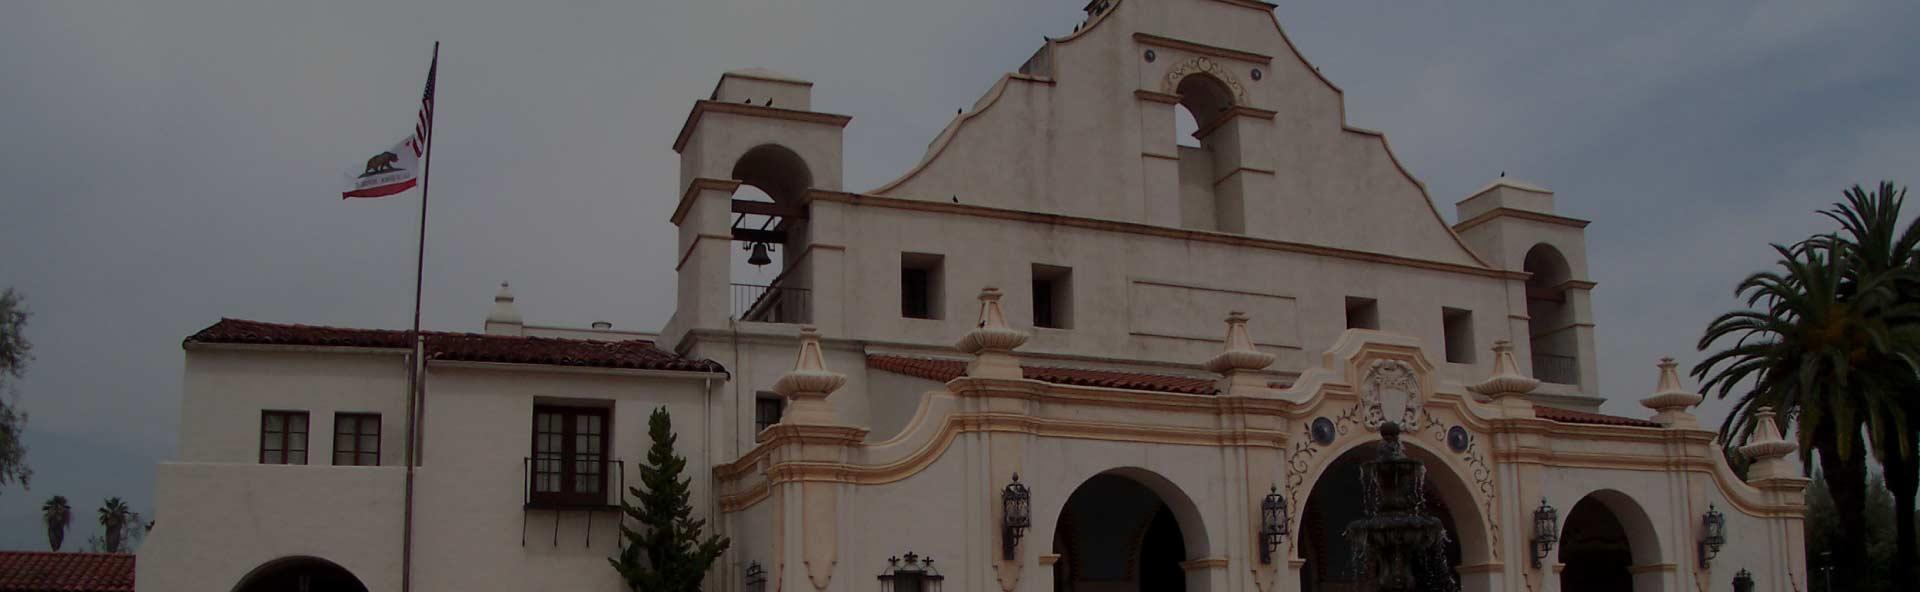 Weclome to NAHREP LA-San Gabriel Valley Chapter